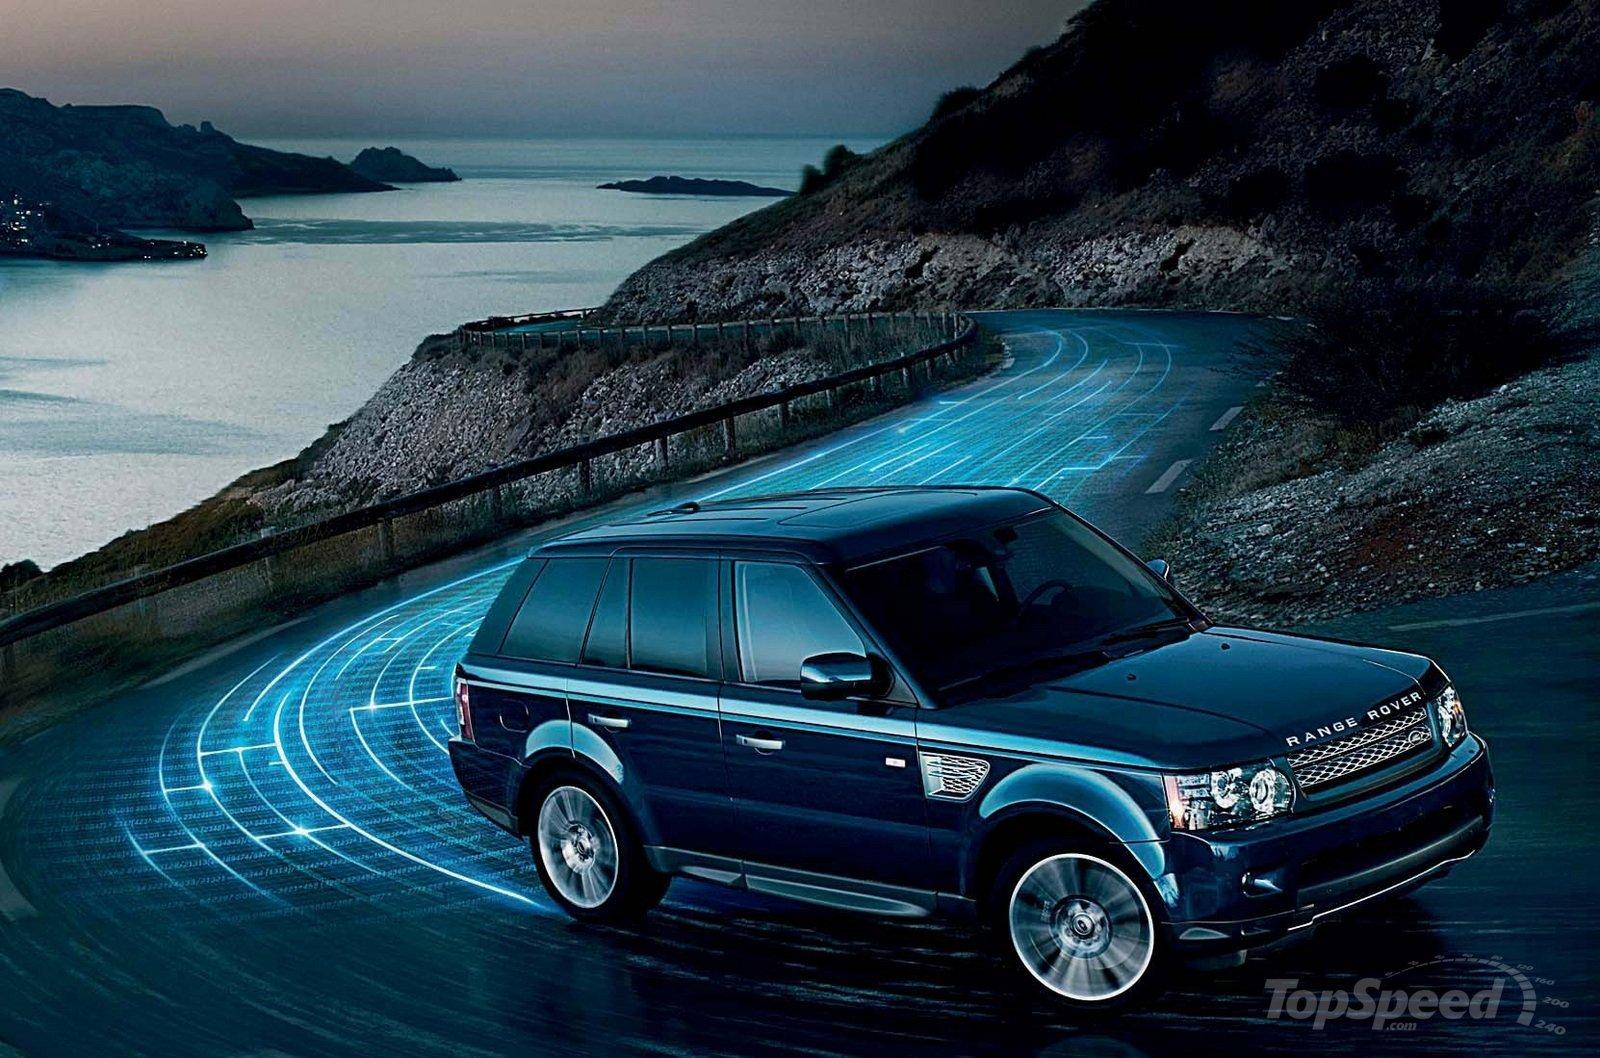 Land Rover Range Rover Sport TDV8 Land Rover